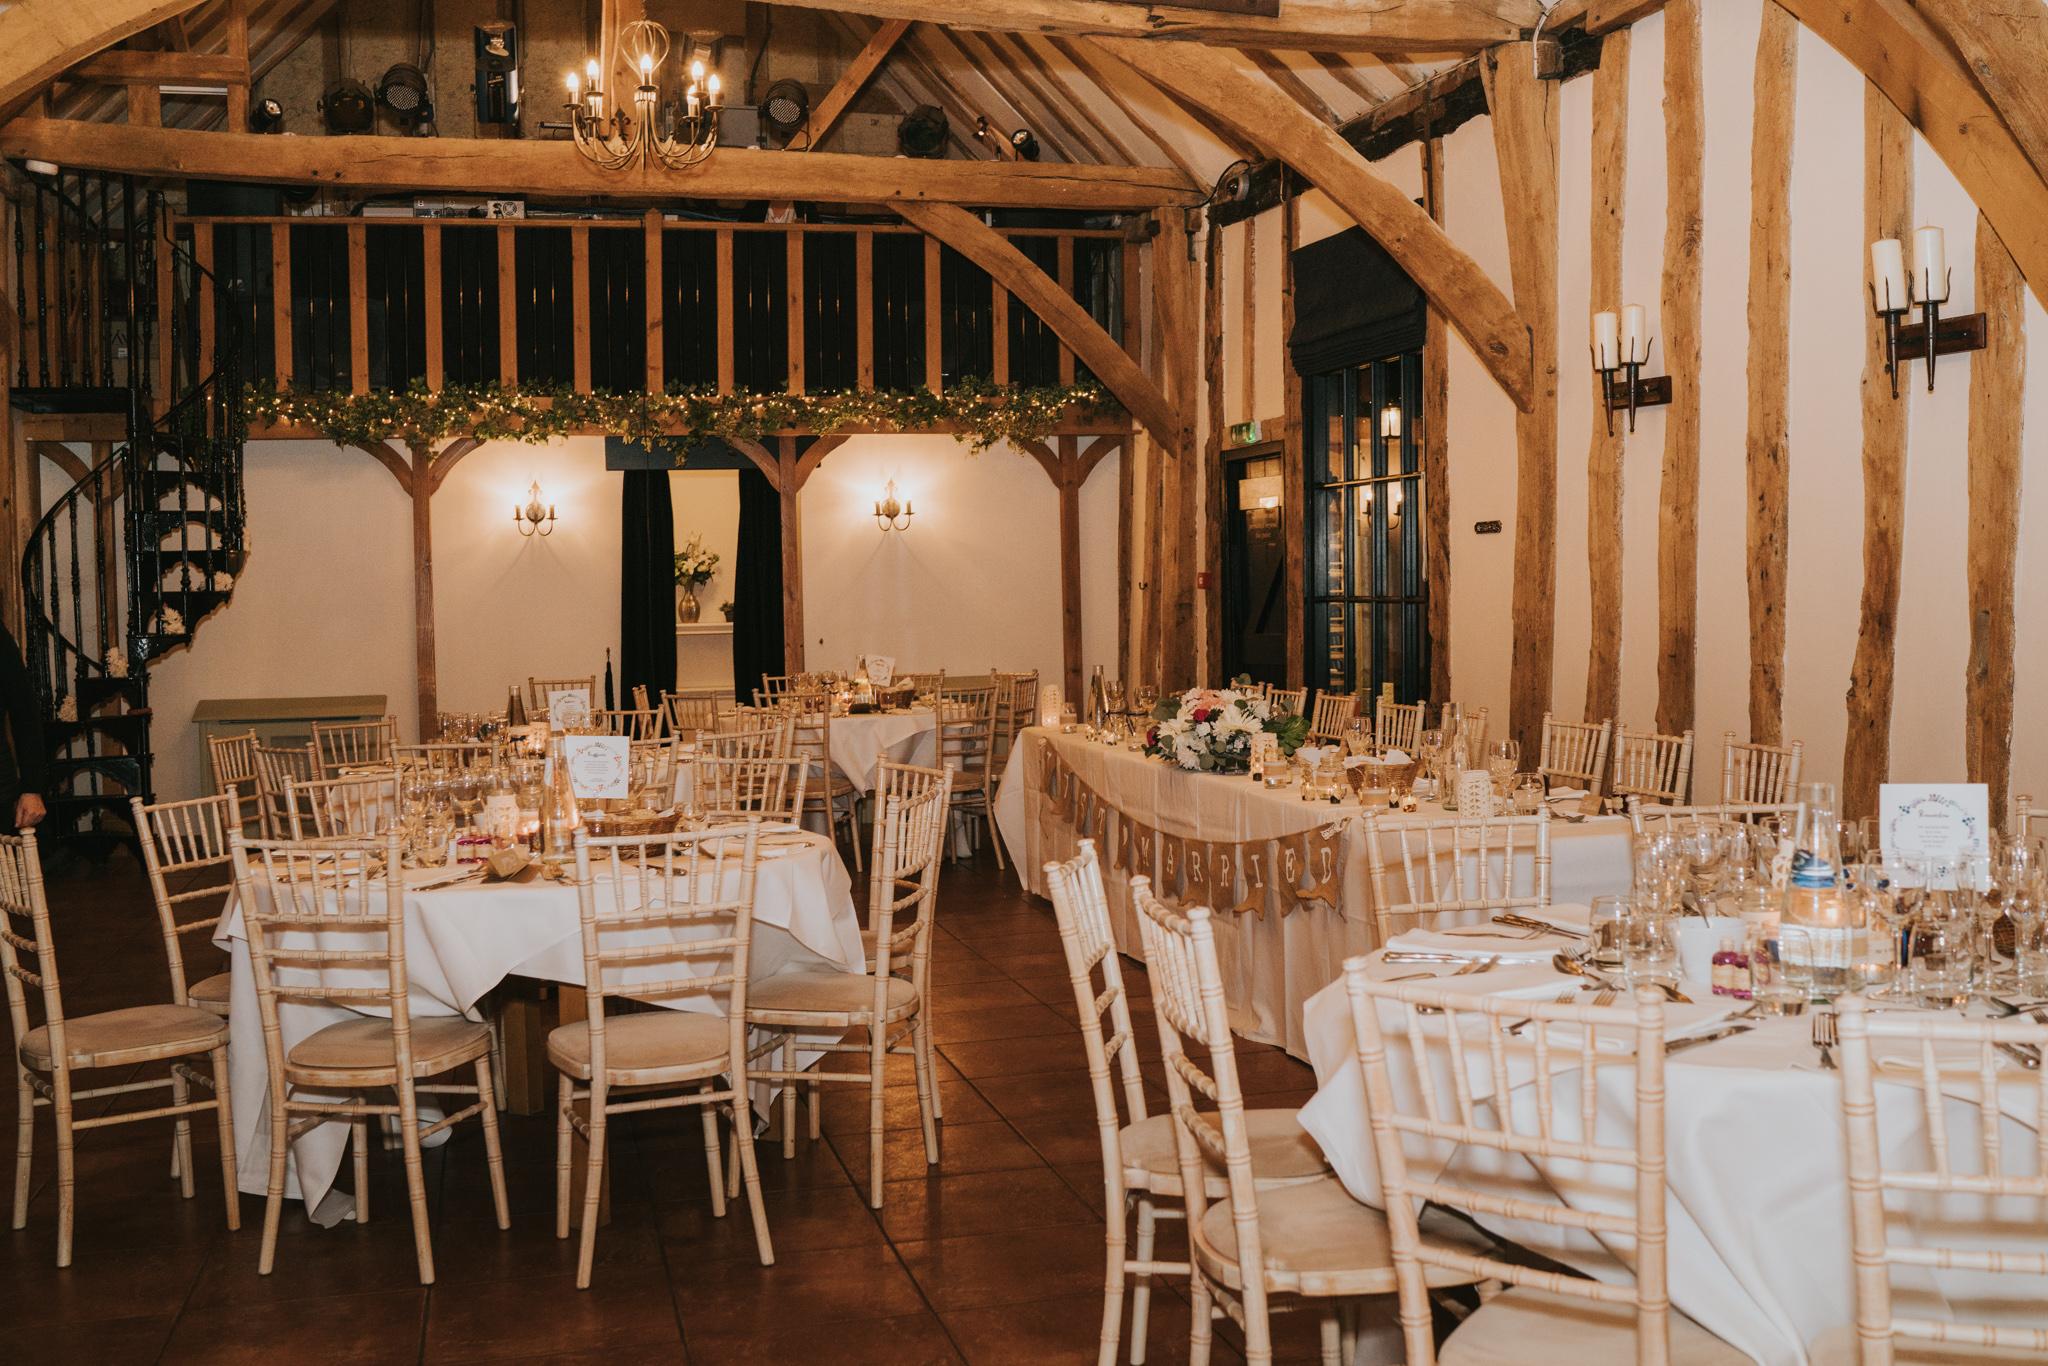 rhia-james-rustic-crabbs-barn-vintage-50s-retro-wedding-grace-elizabeth-colchester-essex-alternative-relaxed-wedding-family-photography-devon-suffolk-norfolk-essex (113 of 138).jpg